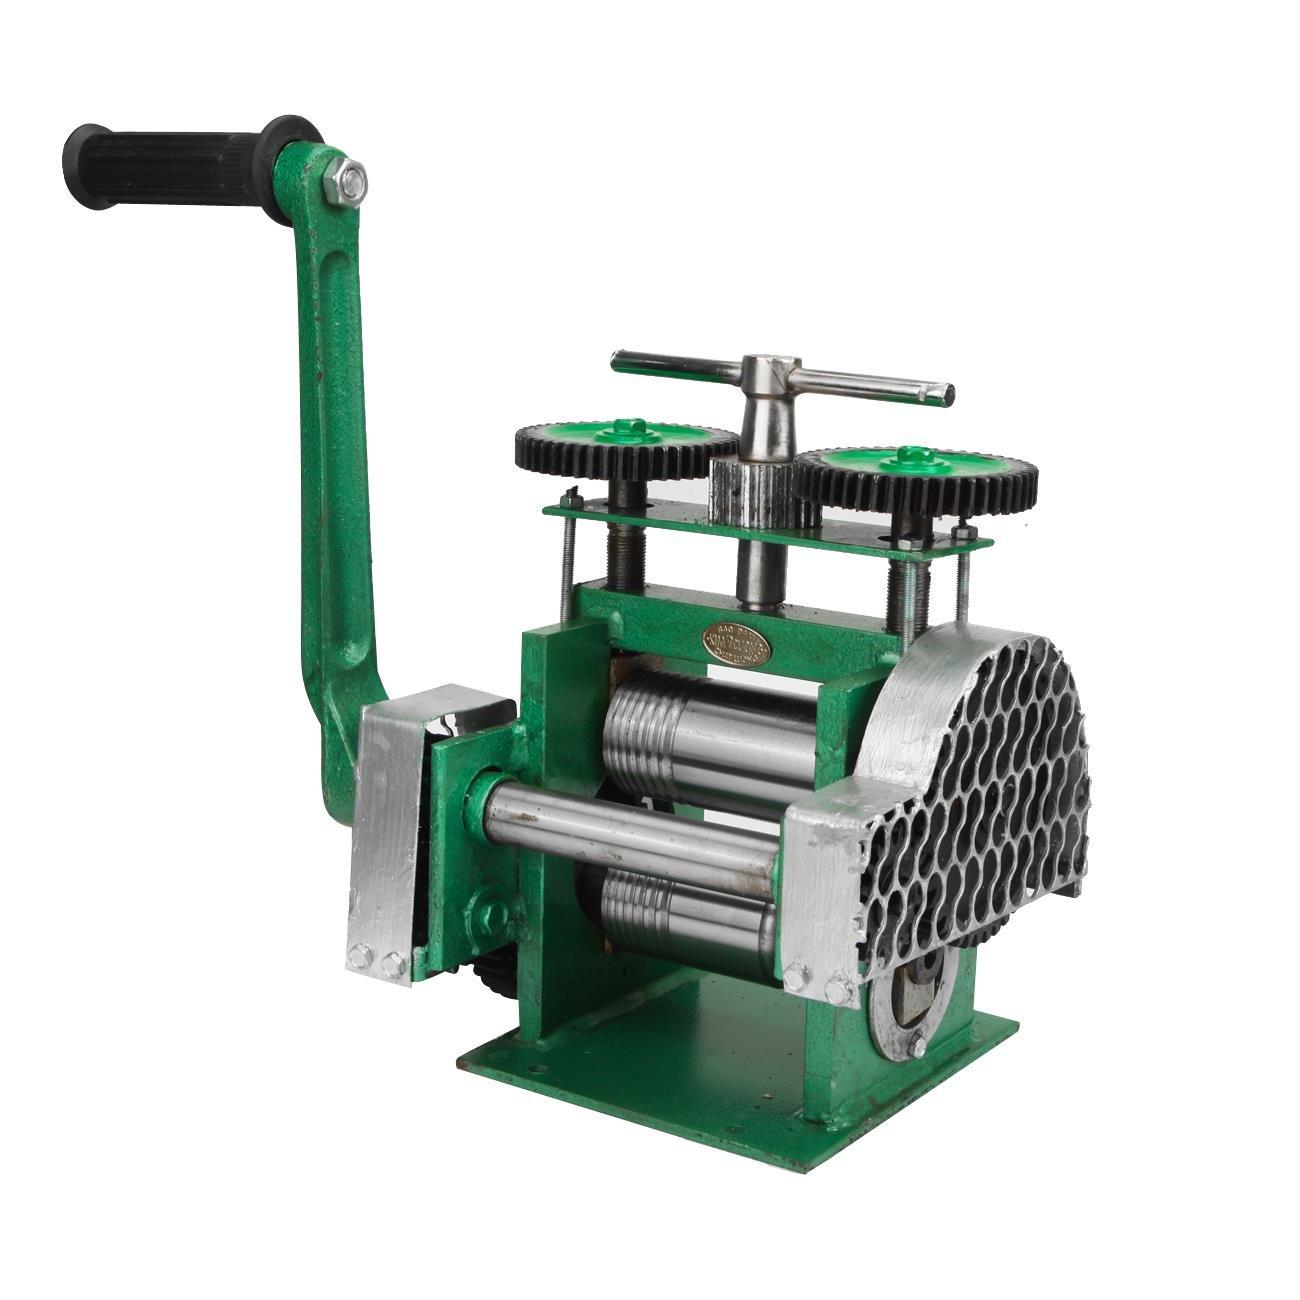 BEAMNOVA Rolling Mill Machine For Jewelry Making Hand Crank Manual Jewelry Press Tableting Tool by BEAMNOVA